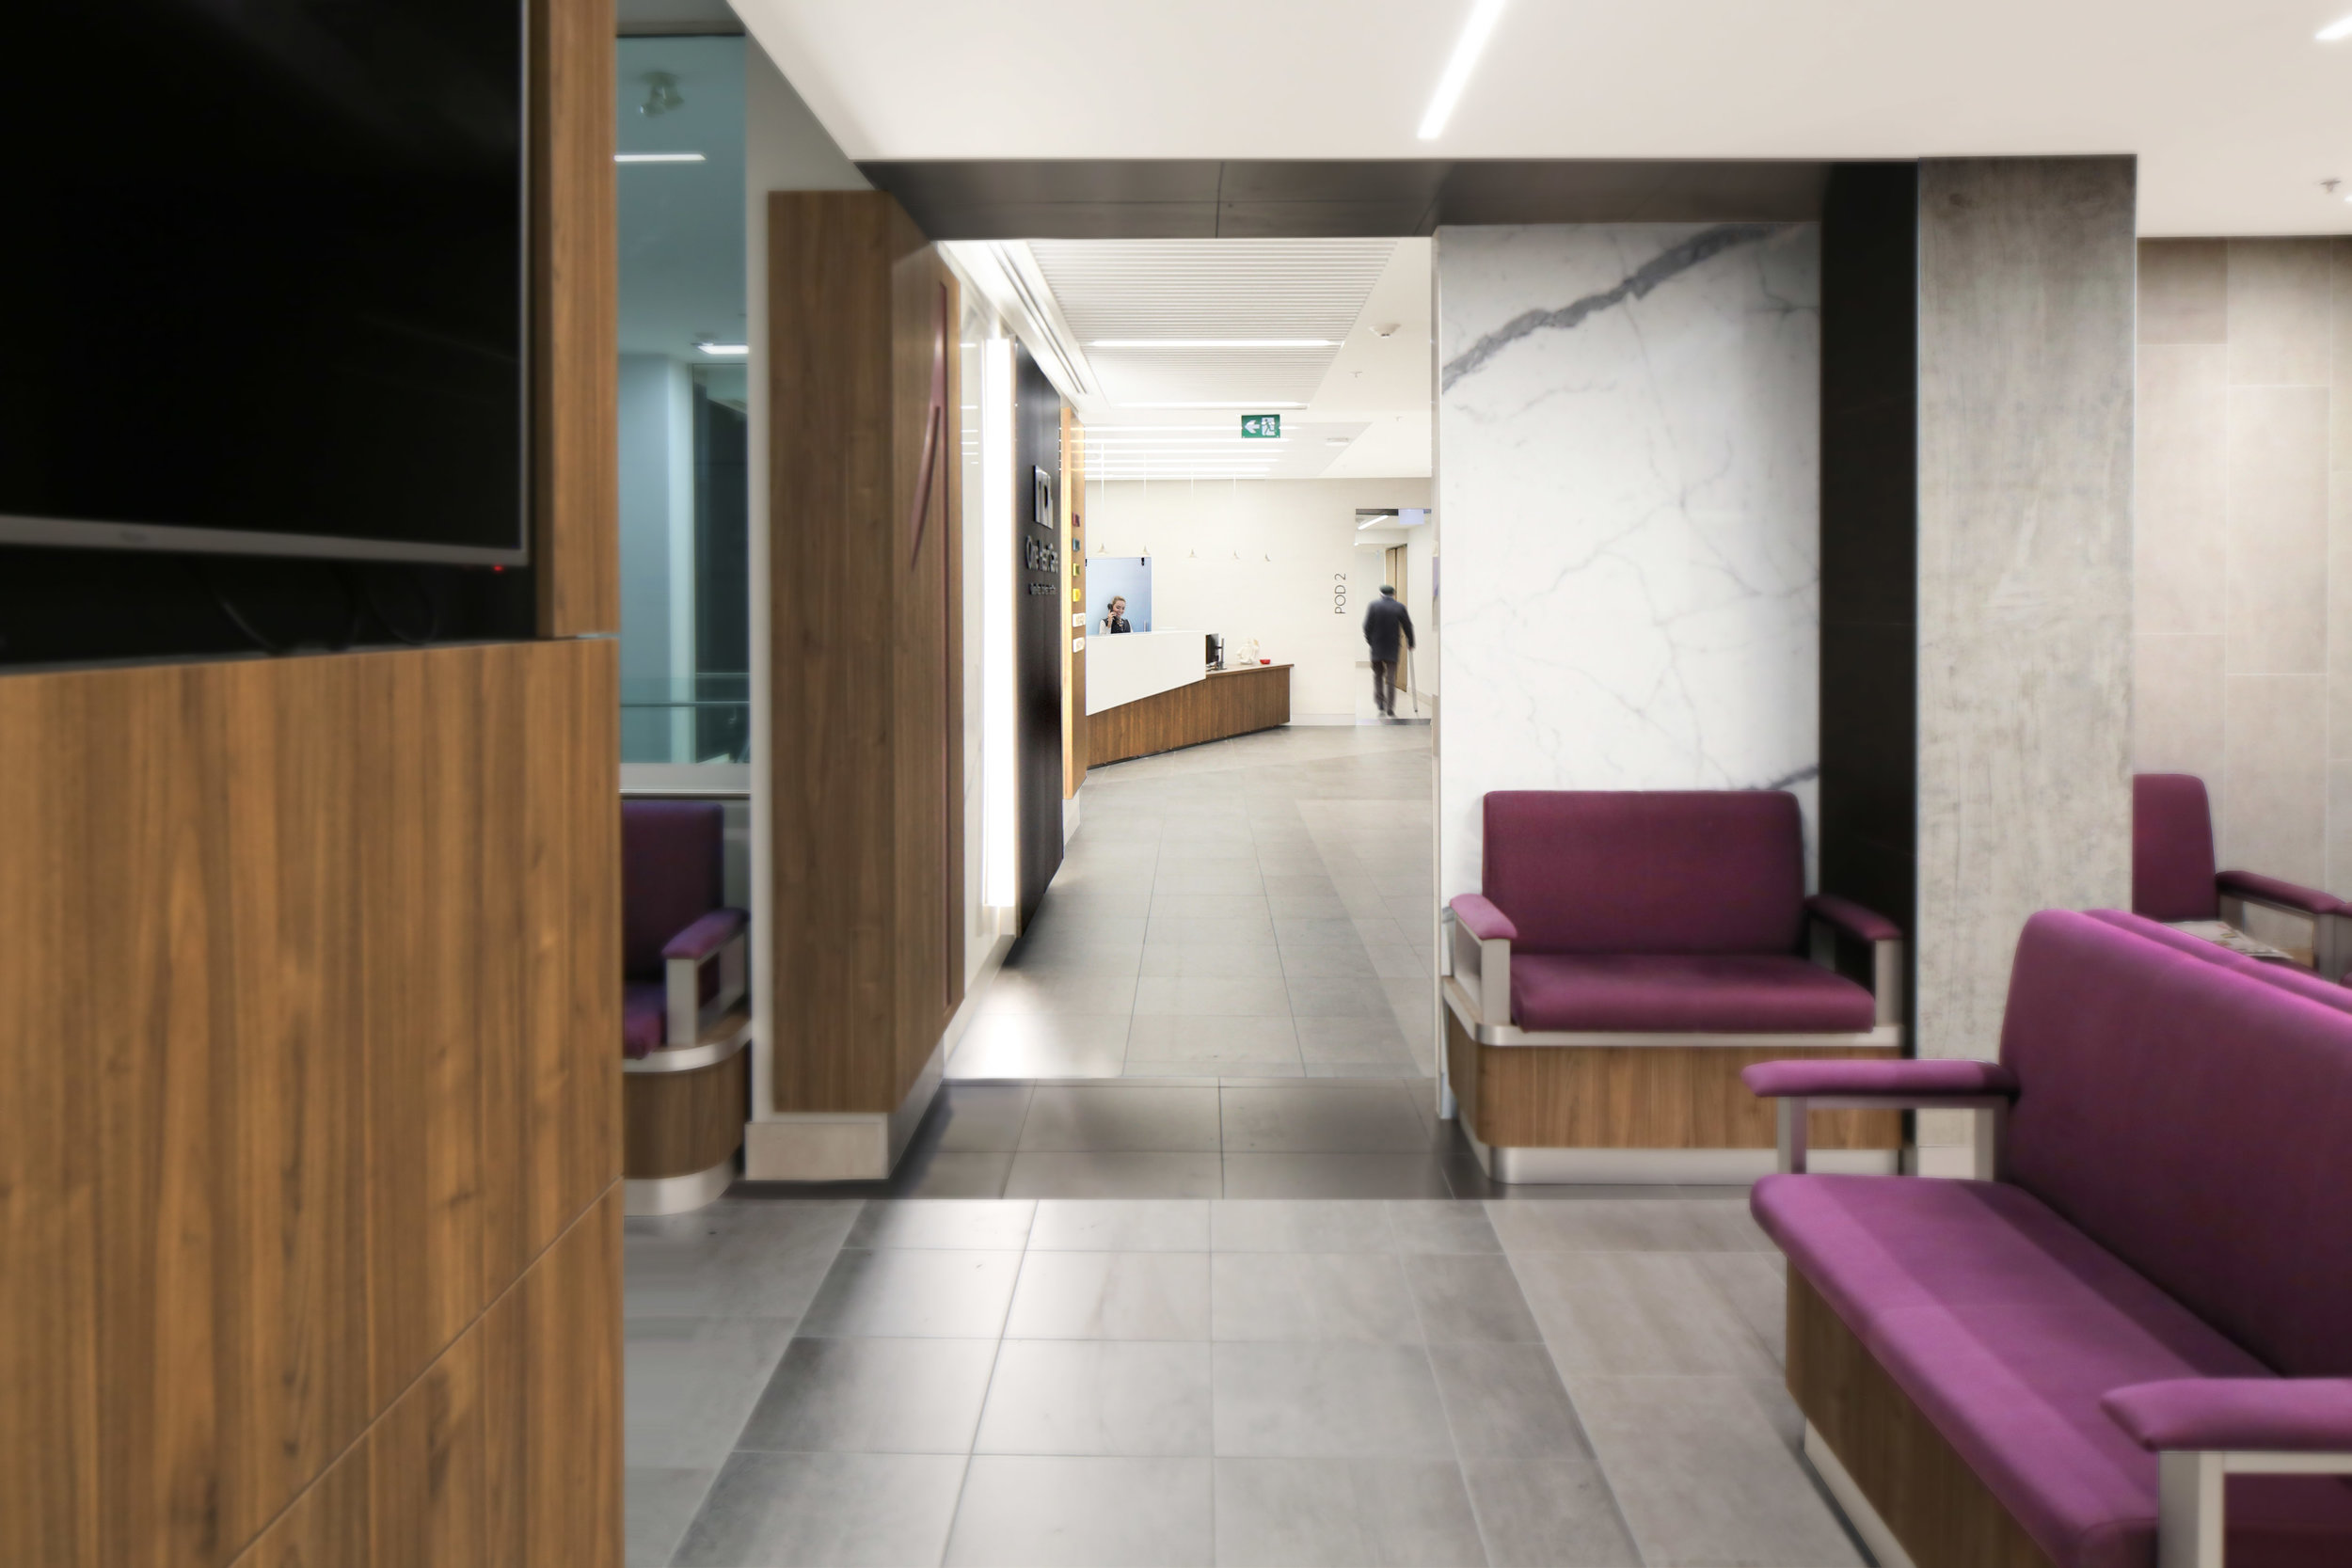 Canada_Toronto_Healthcare_Cardiology_Design_architect_waiting-pod-1.jpg.jpg